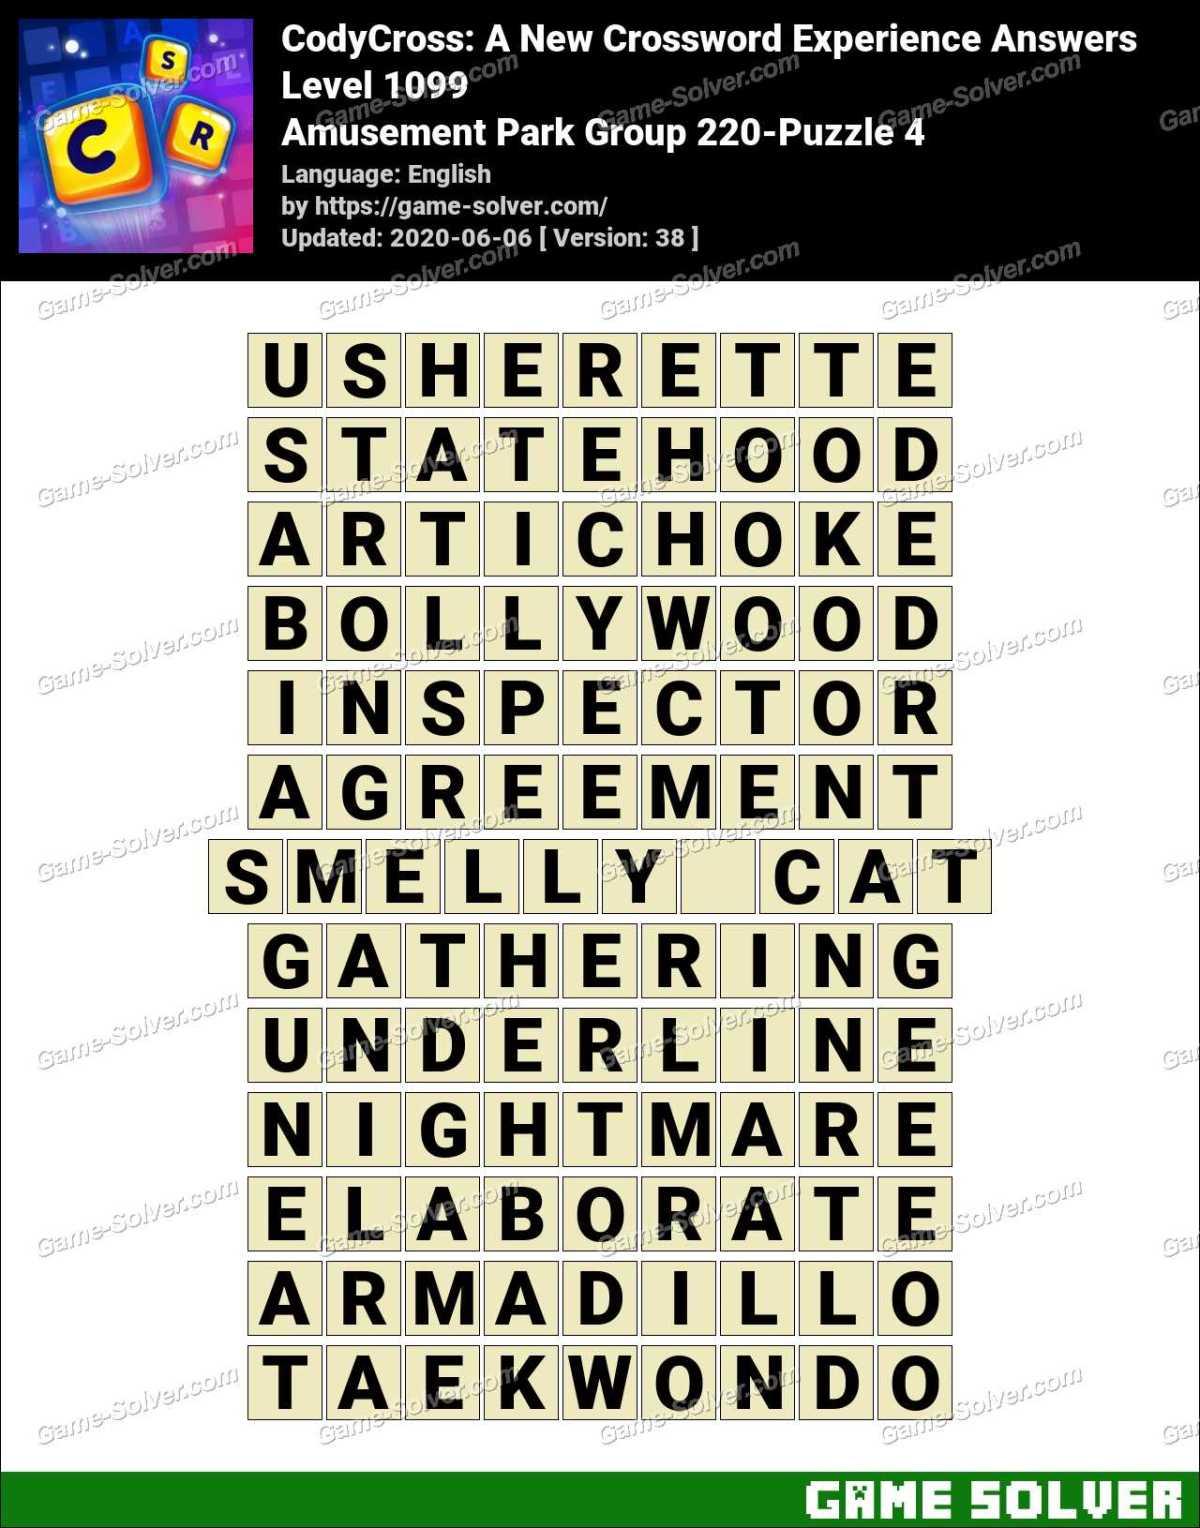 CodyCross Amusement Park Group 220-Puzzle 4 Answers